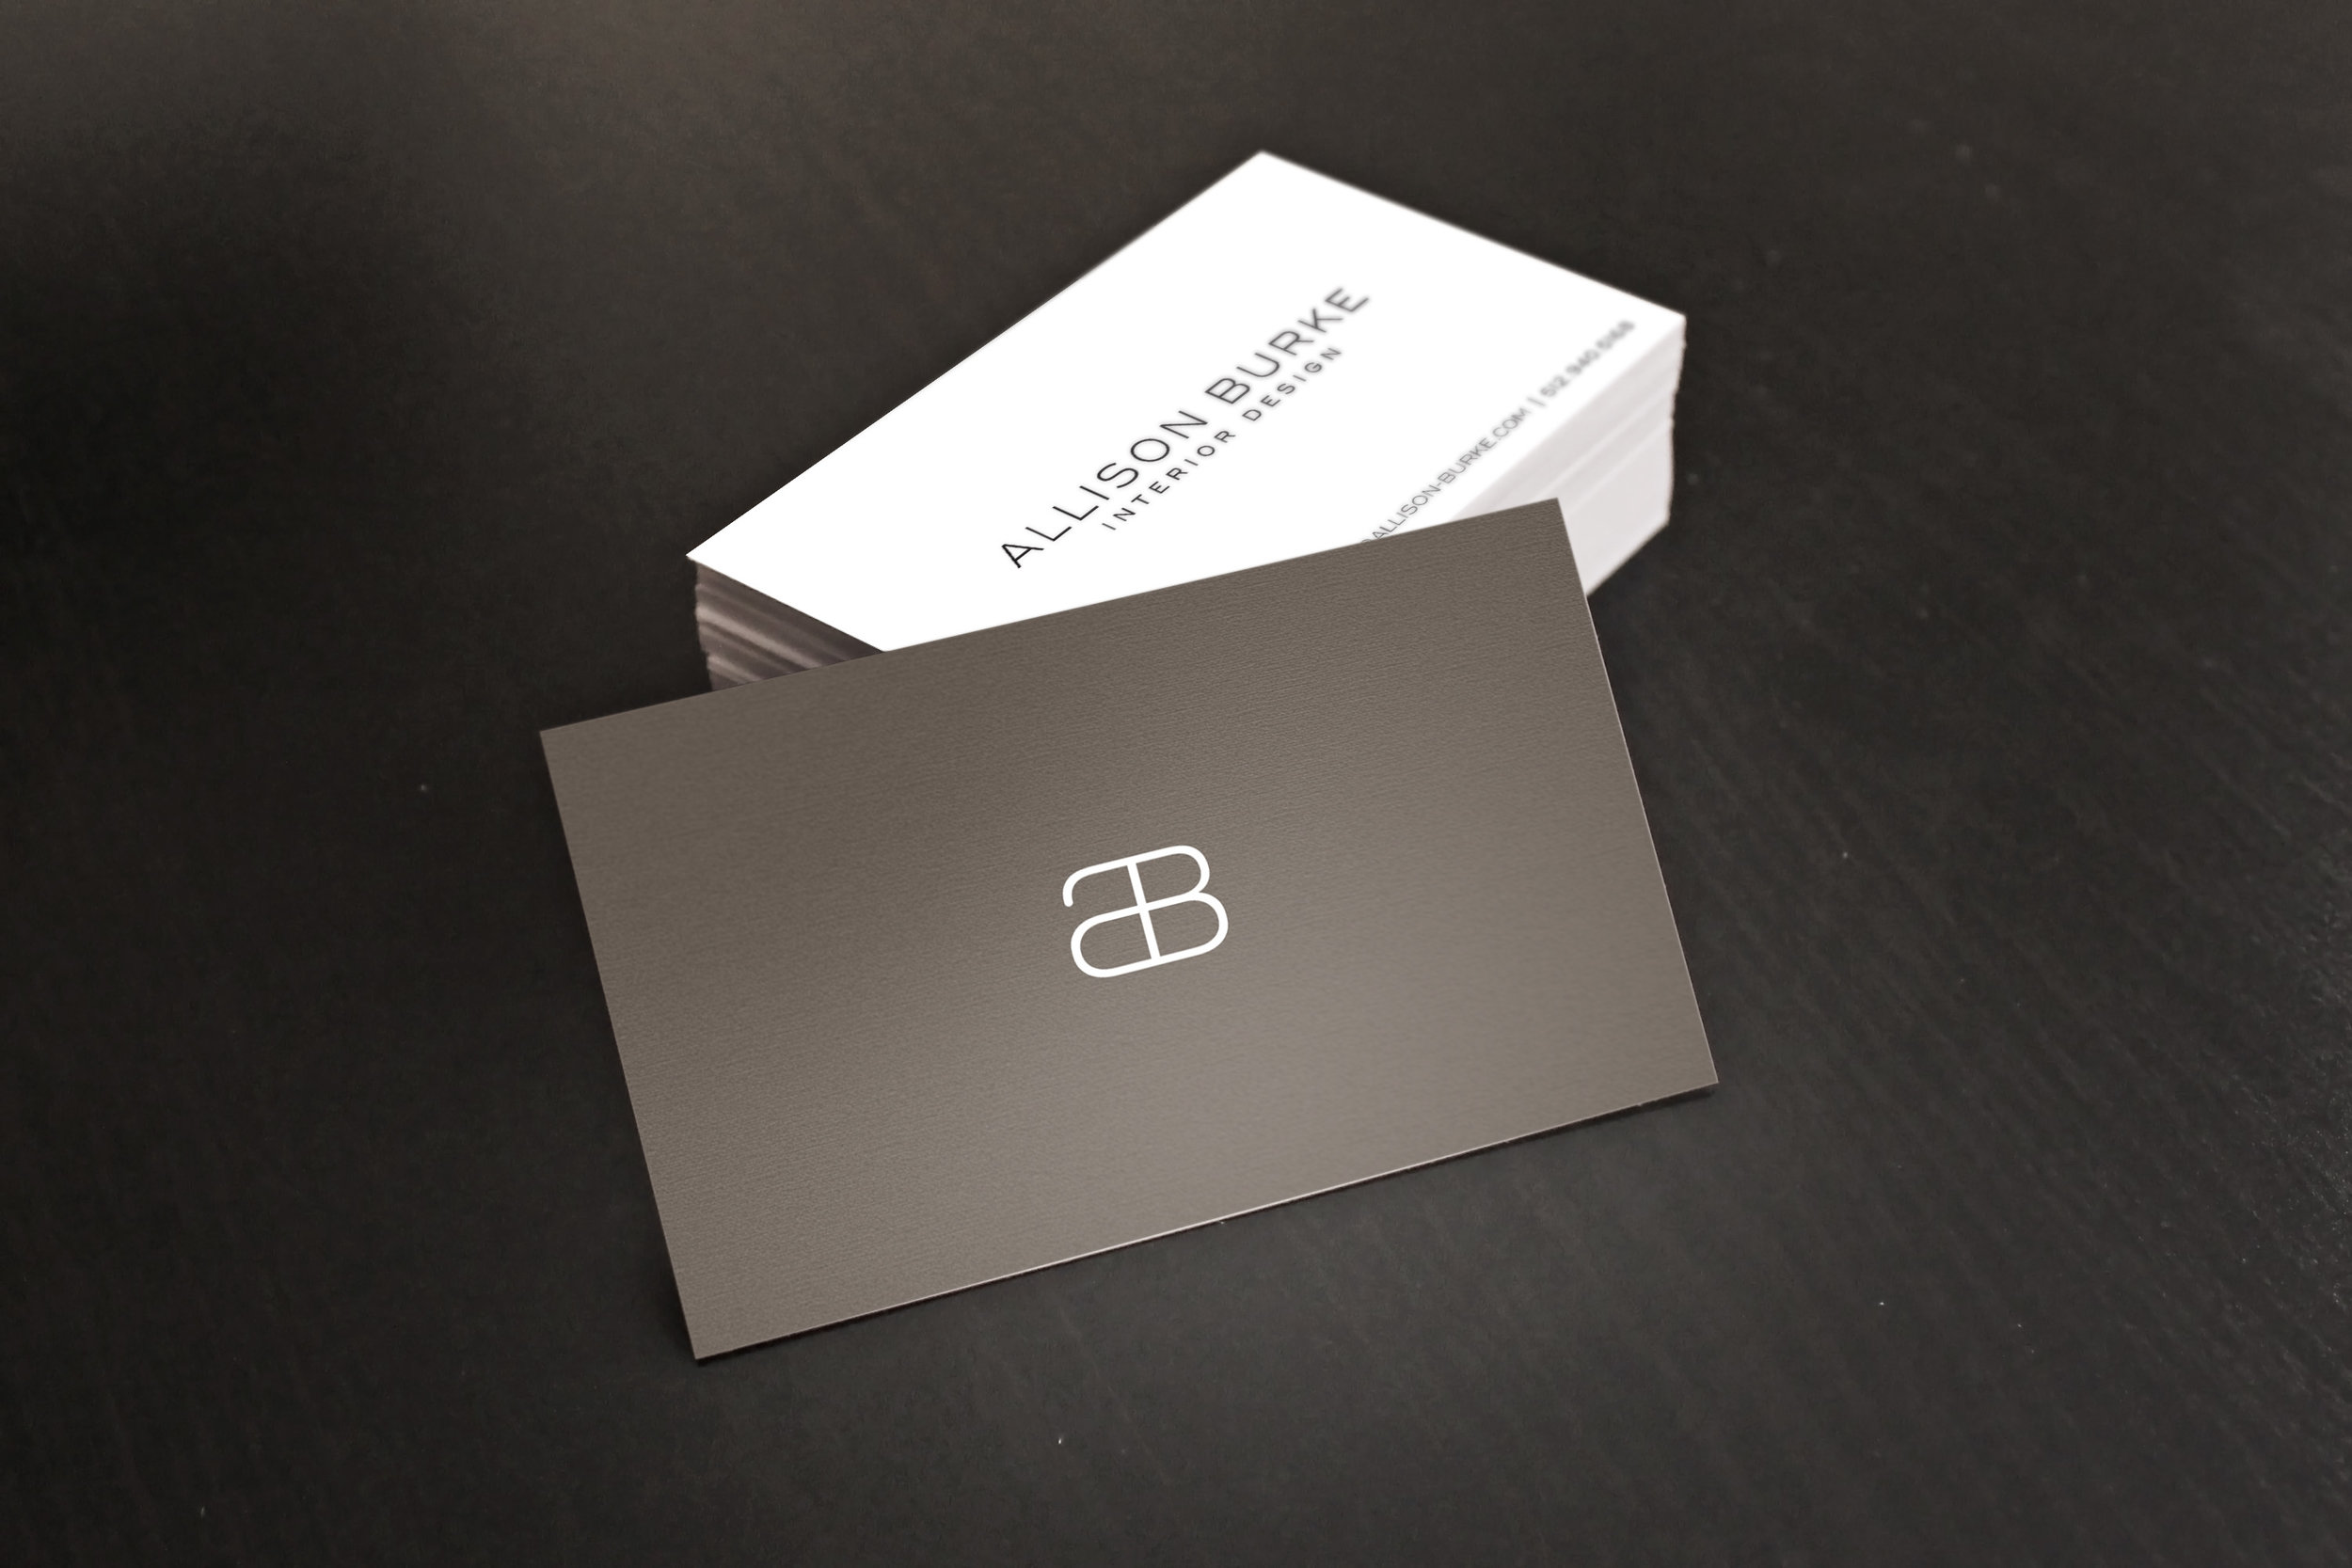 AB card mockup.jpg